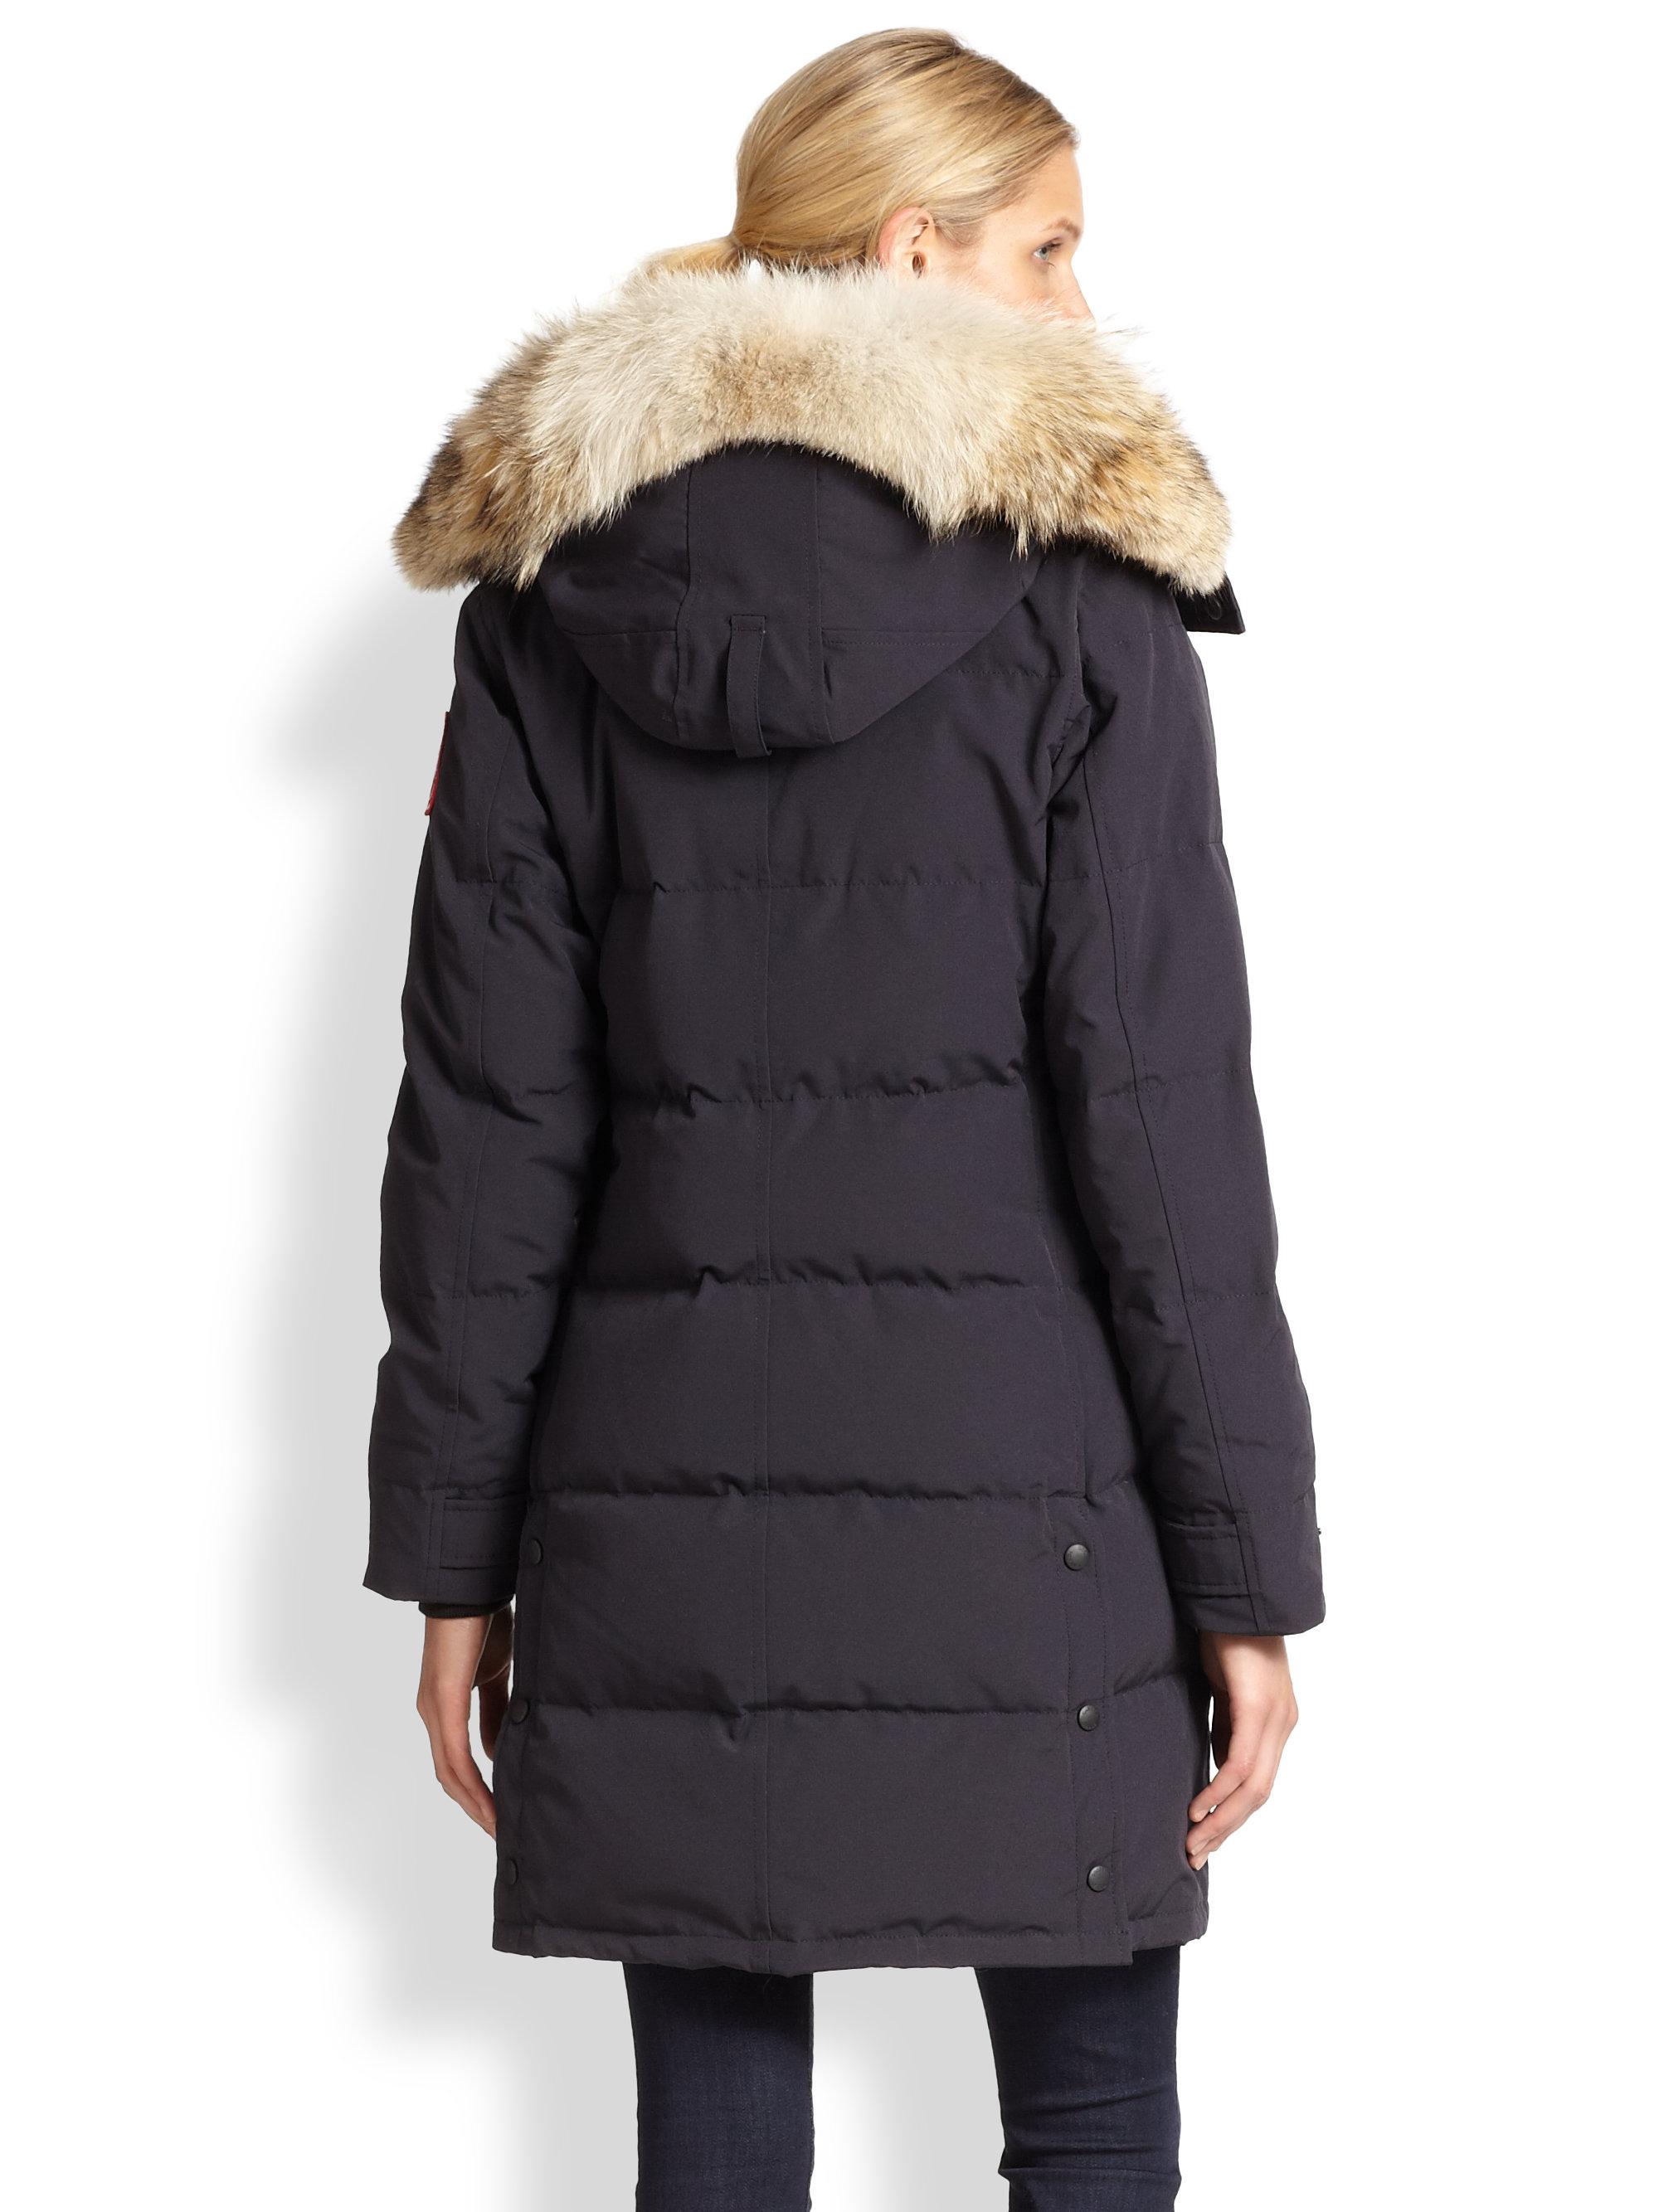 Canada Goose victoria parka sale price - Canada goose Shelburne Parka in Black | Lyst